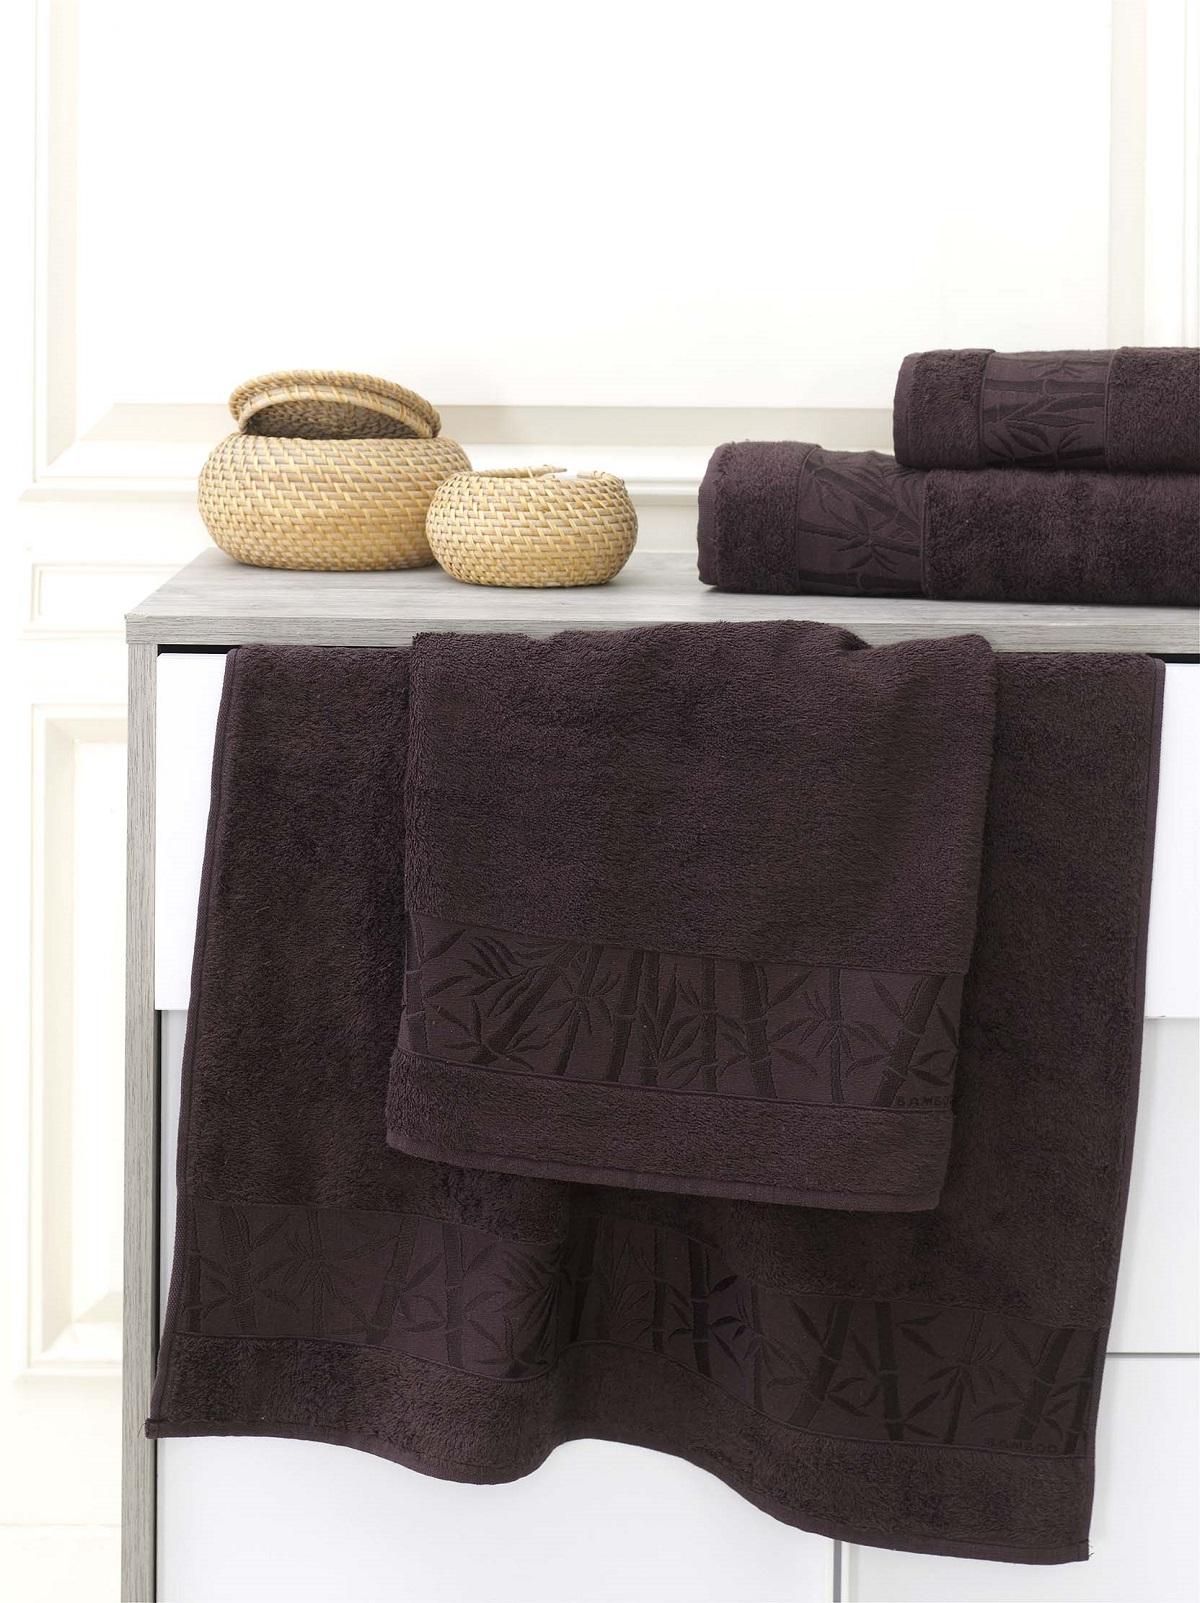 Полотенца Karna Полотенце Pamira Цвет: Темно-Коричневый (70х140 см) полотенца karna полотенце iteka цвет коричневый 70х140 см